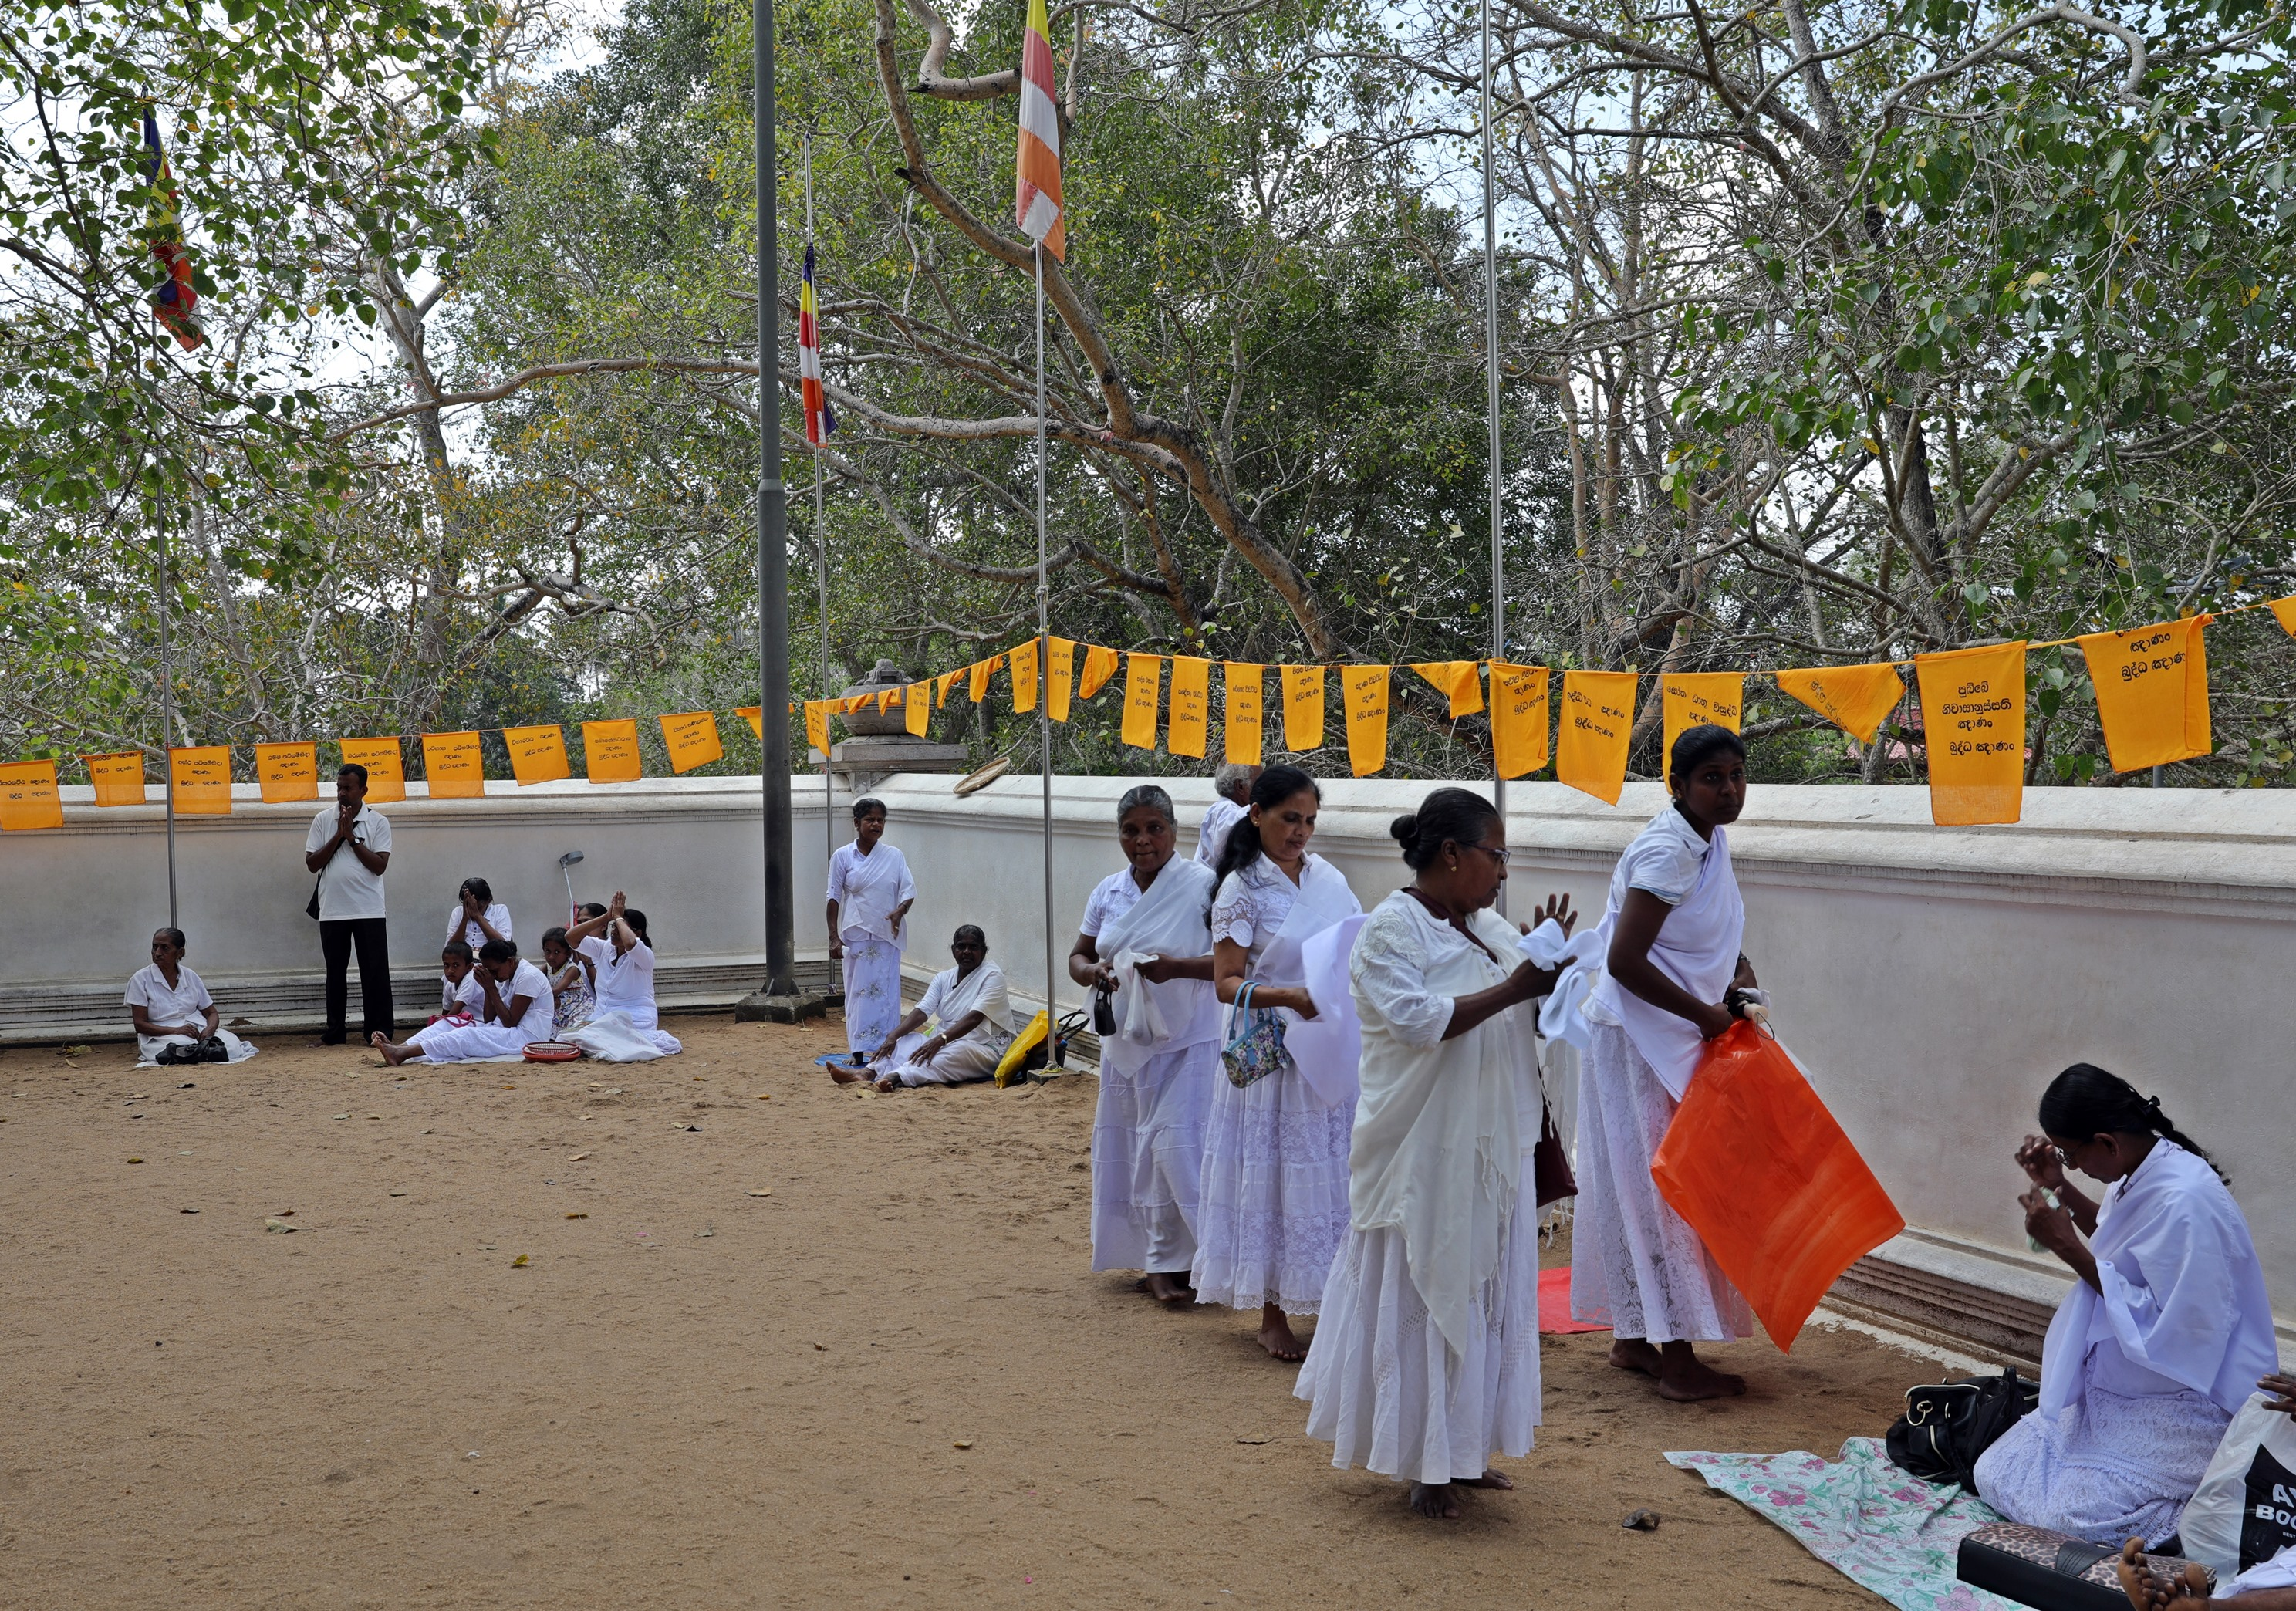 Worshipers at Sri Maha Bodhi Temple, Anuradhapura